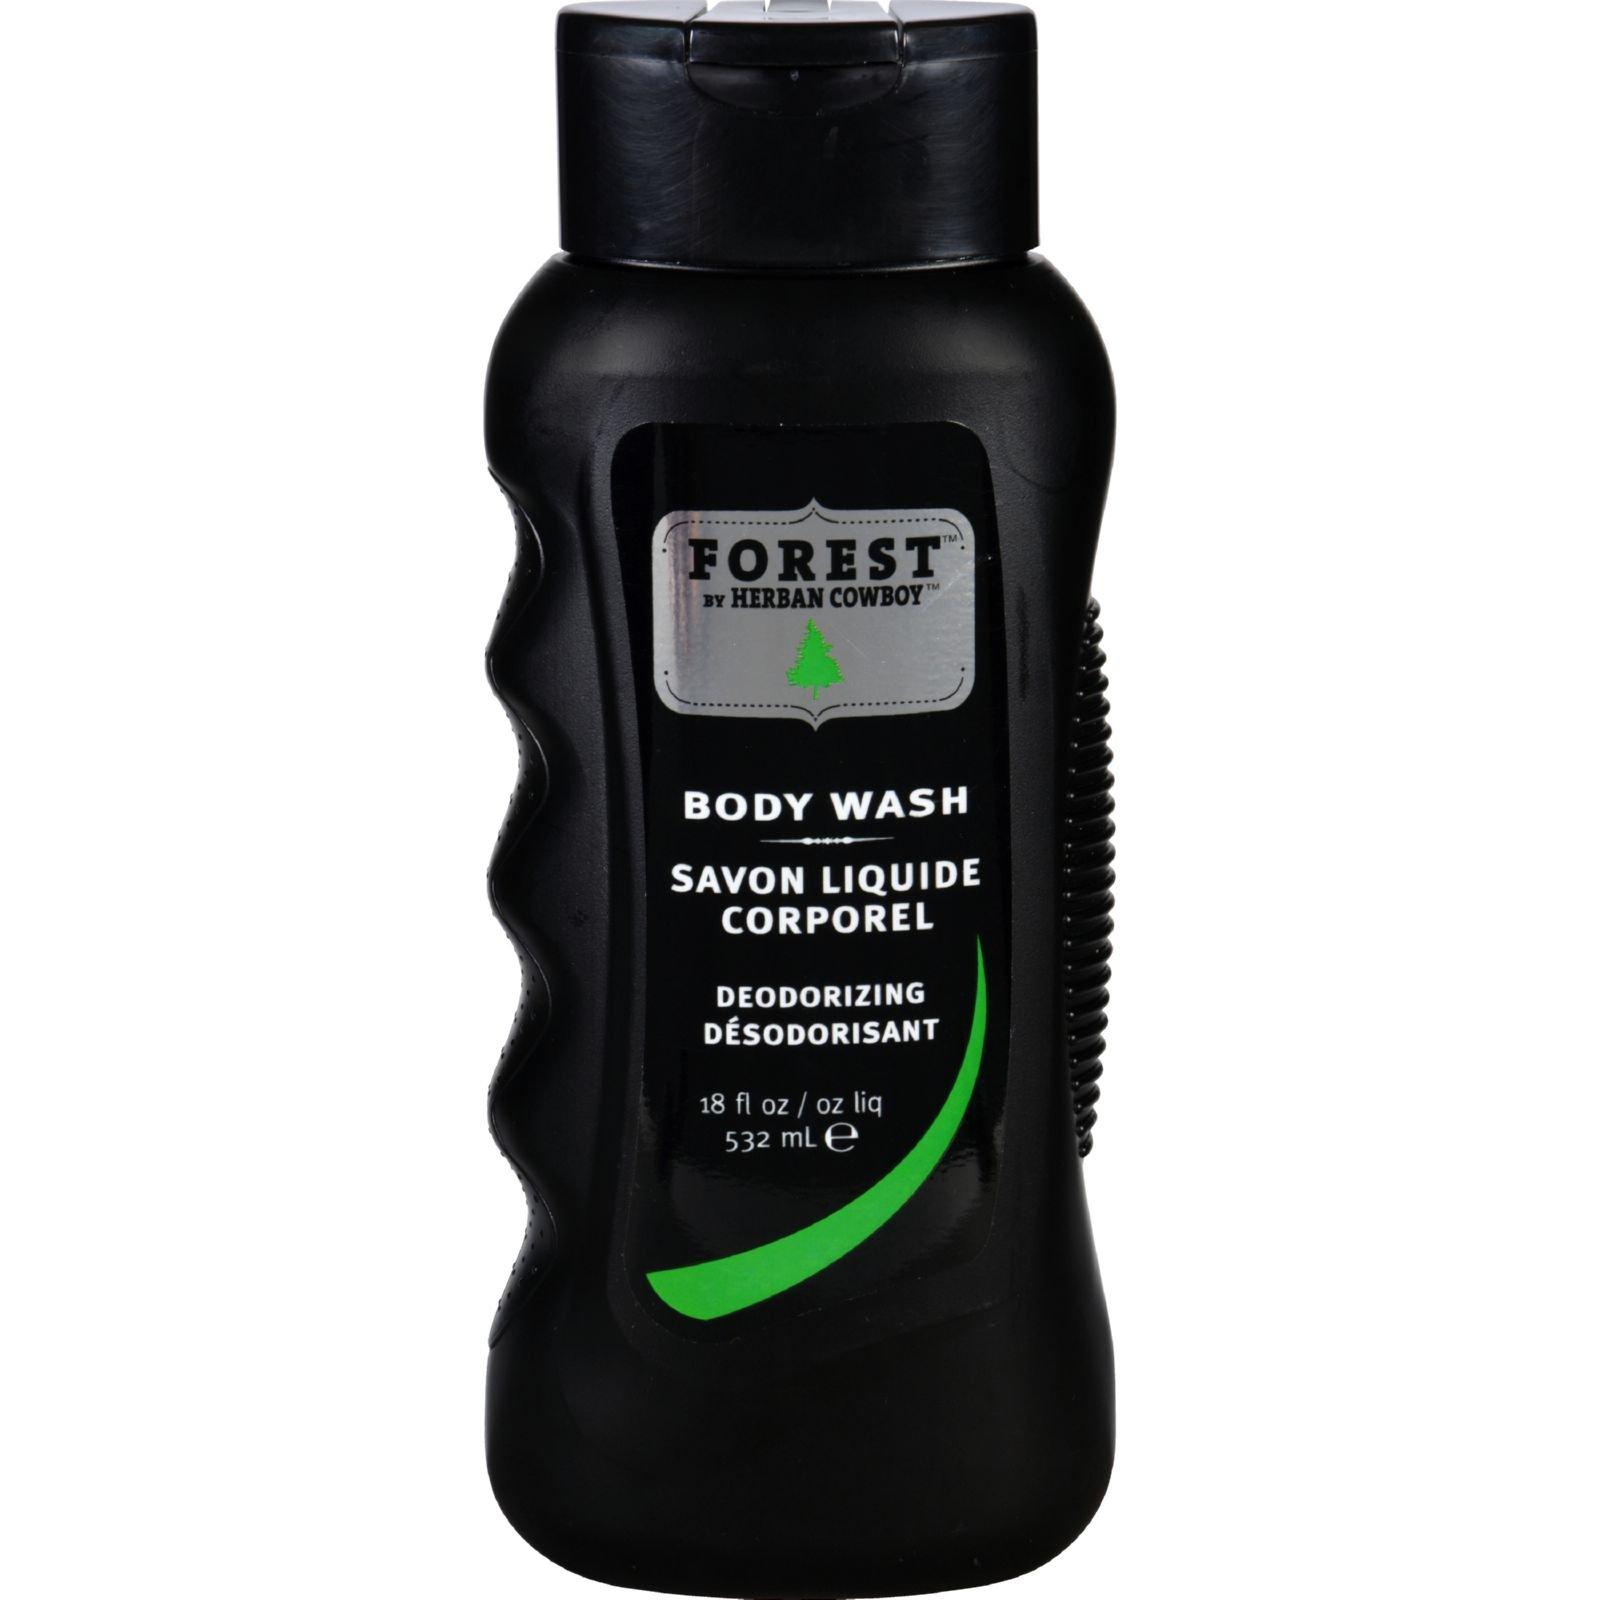 Herban Cowboy Forest Body Wash, 18 Ounce